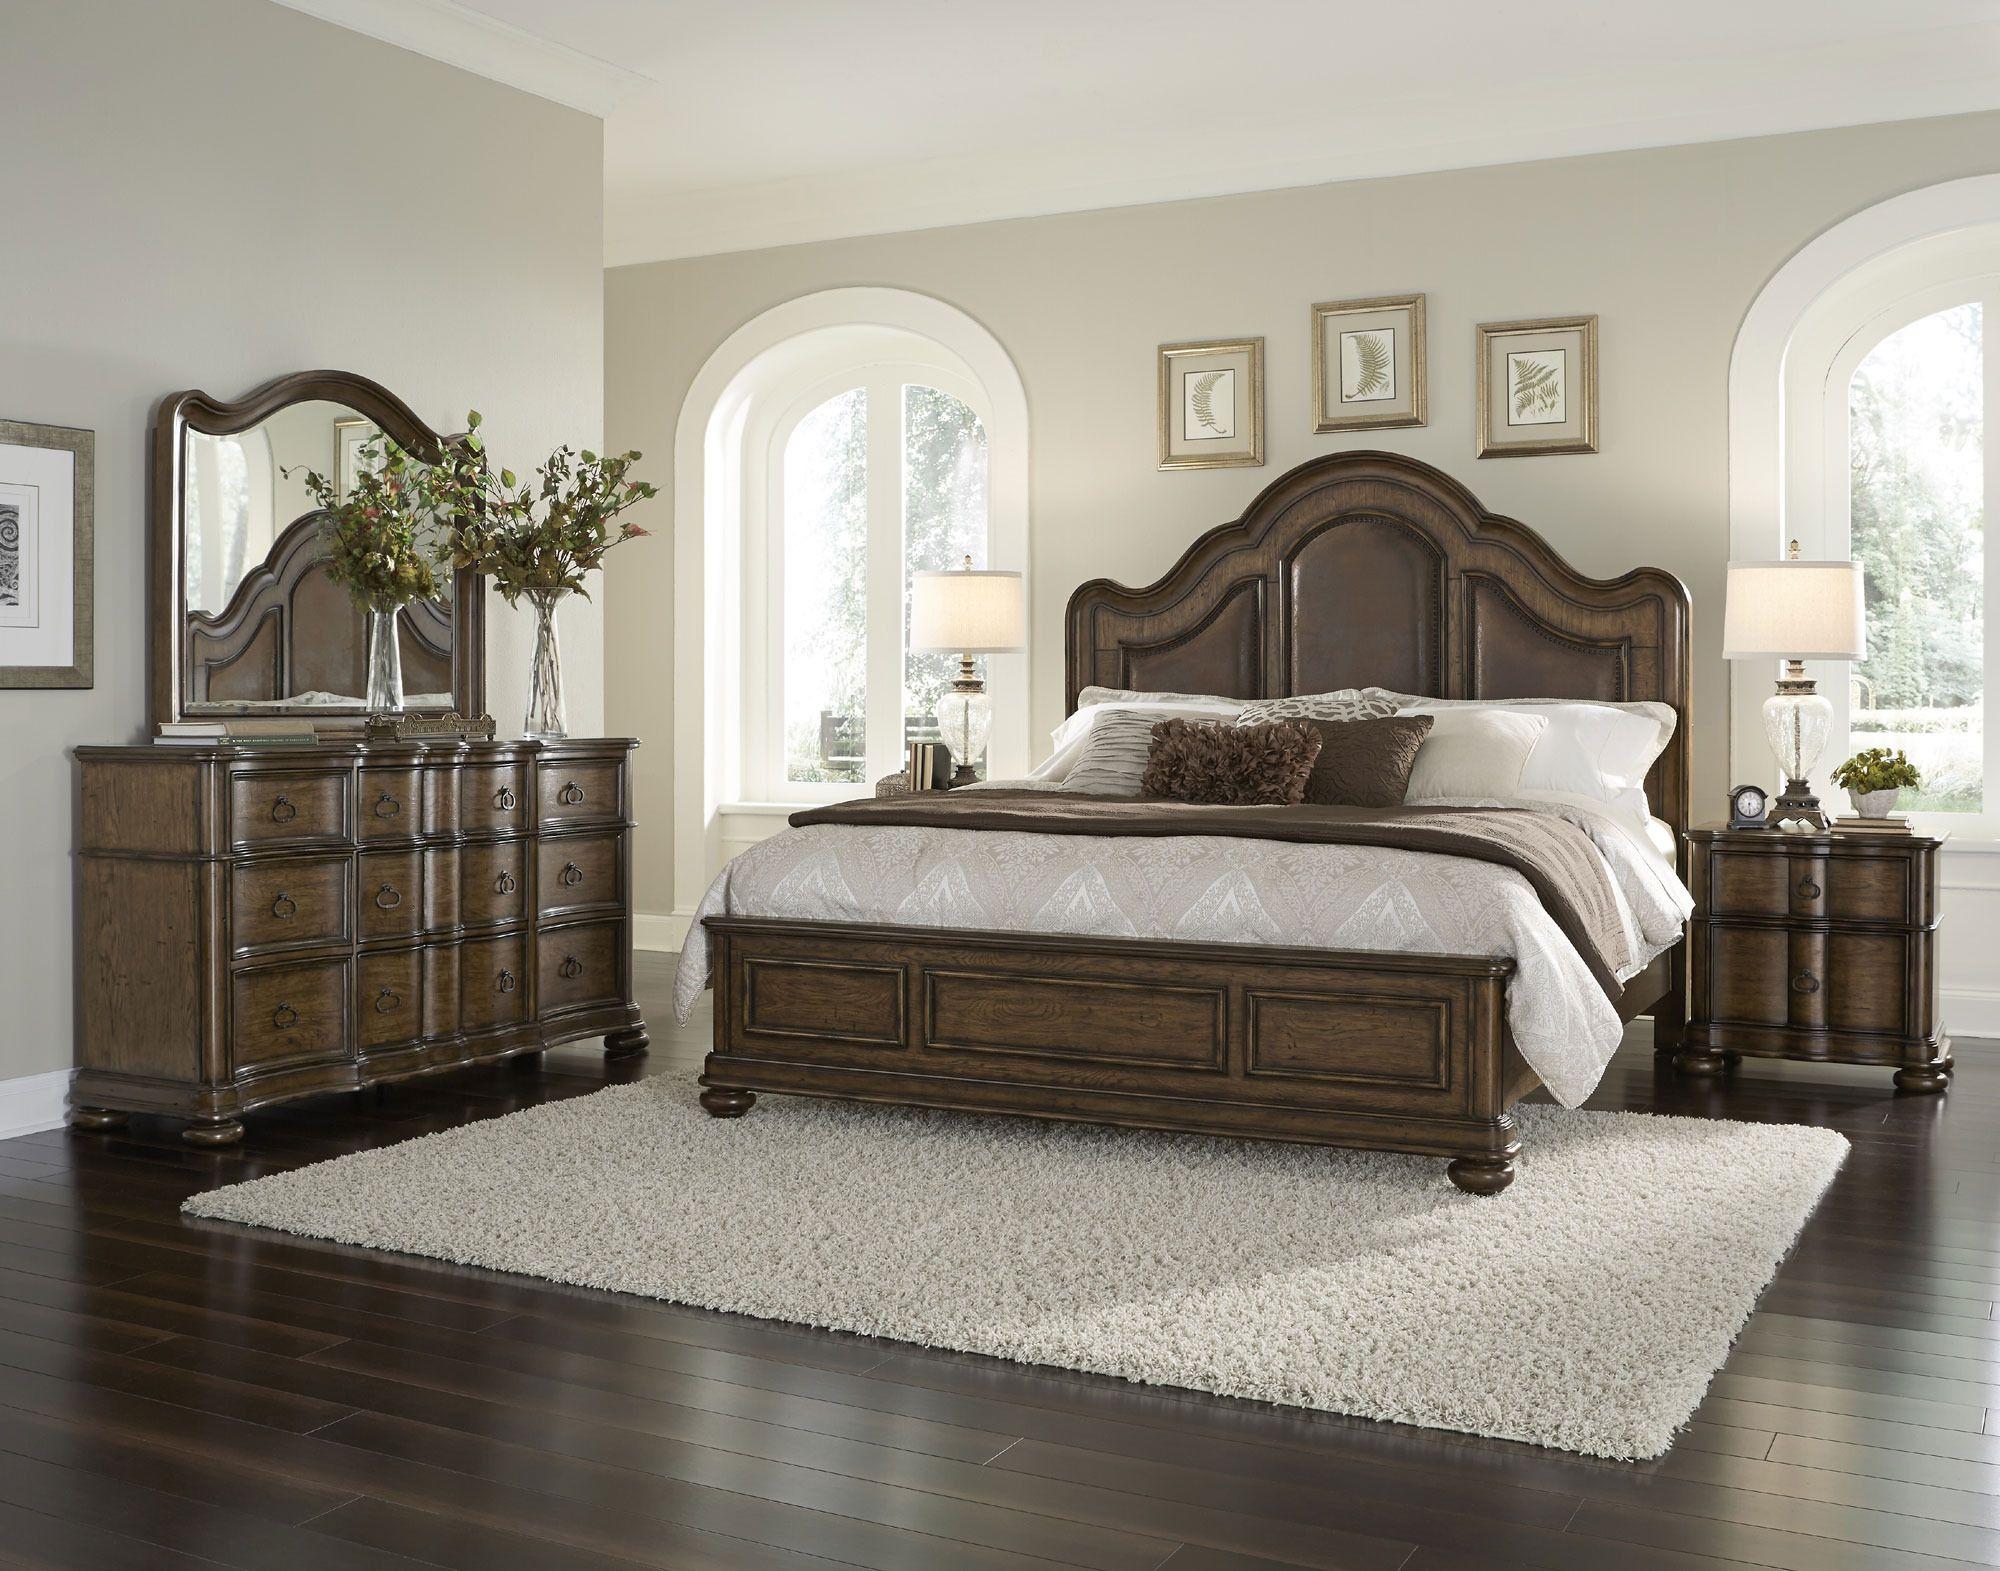 Quentin Low Profile Bedroom Set By Pulaski Home Gallery Stores Bedroom Set King Size Bedroom Sets Bedroom Sets